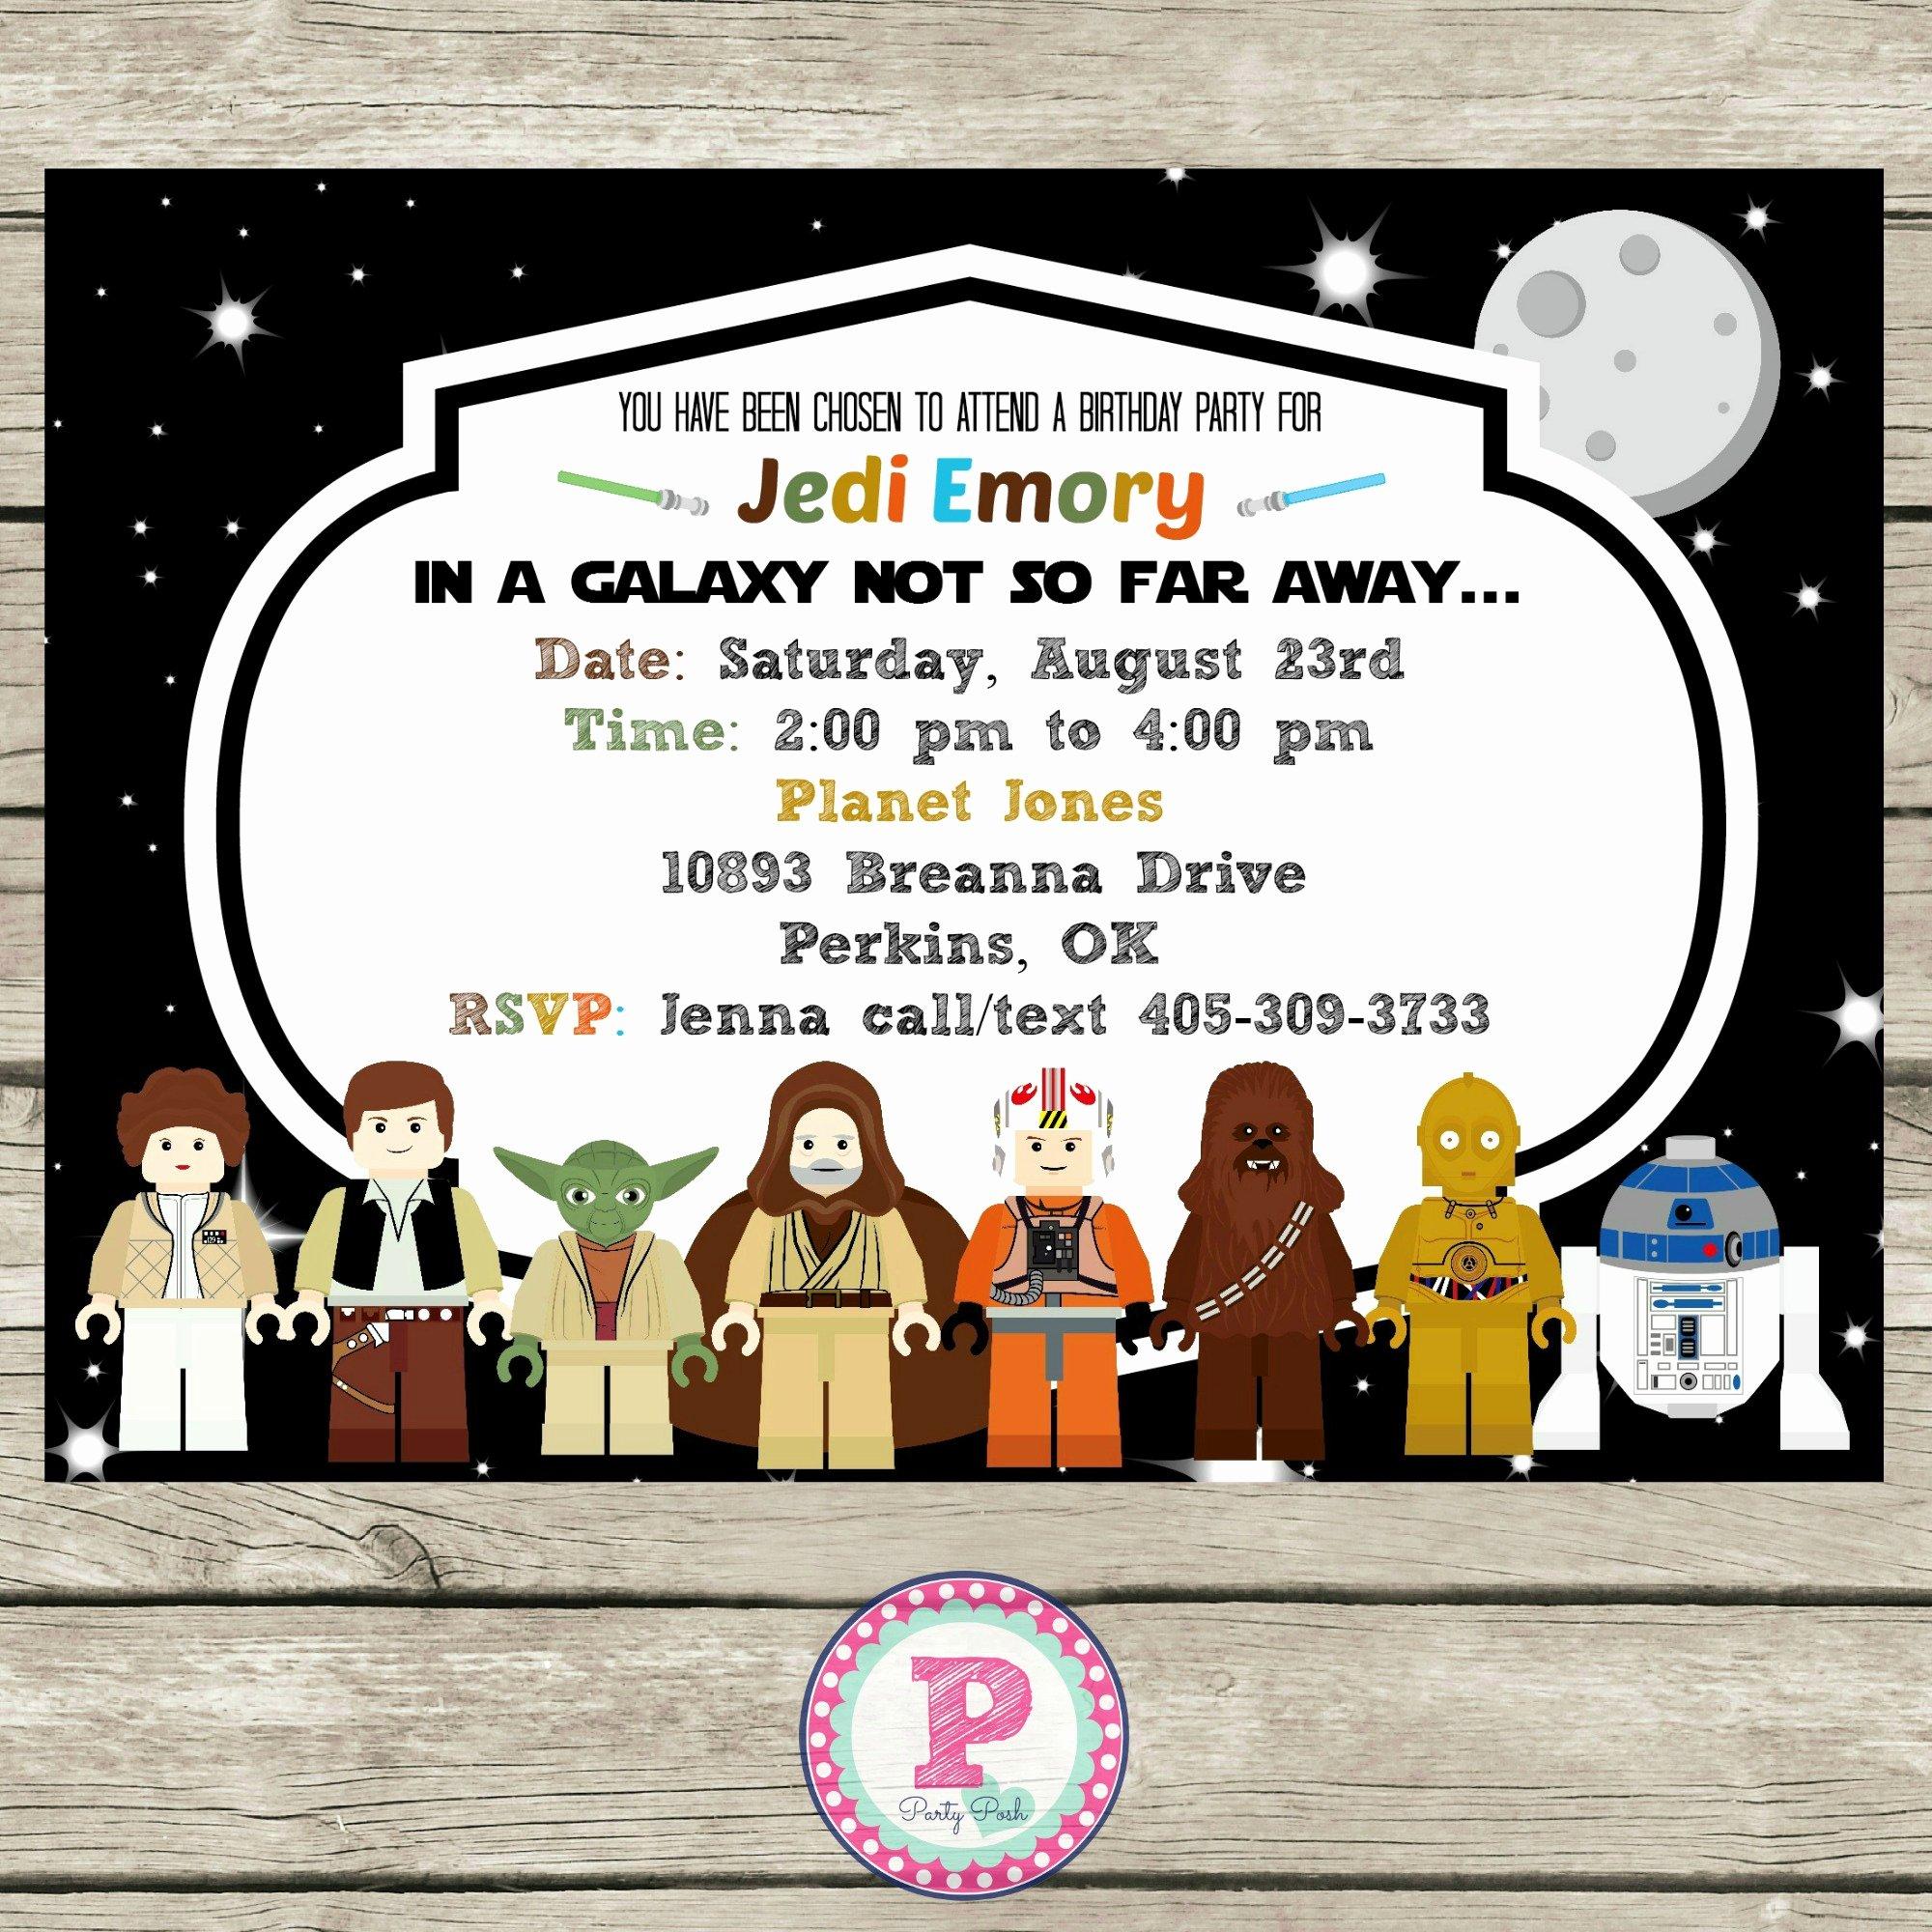 Lego Star Wars Party Invites Fresh Star Wars Lego Birthday Party Ideas Invitations